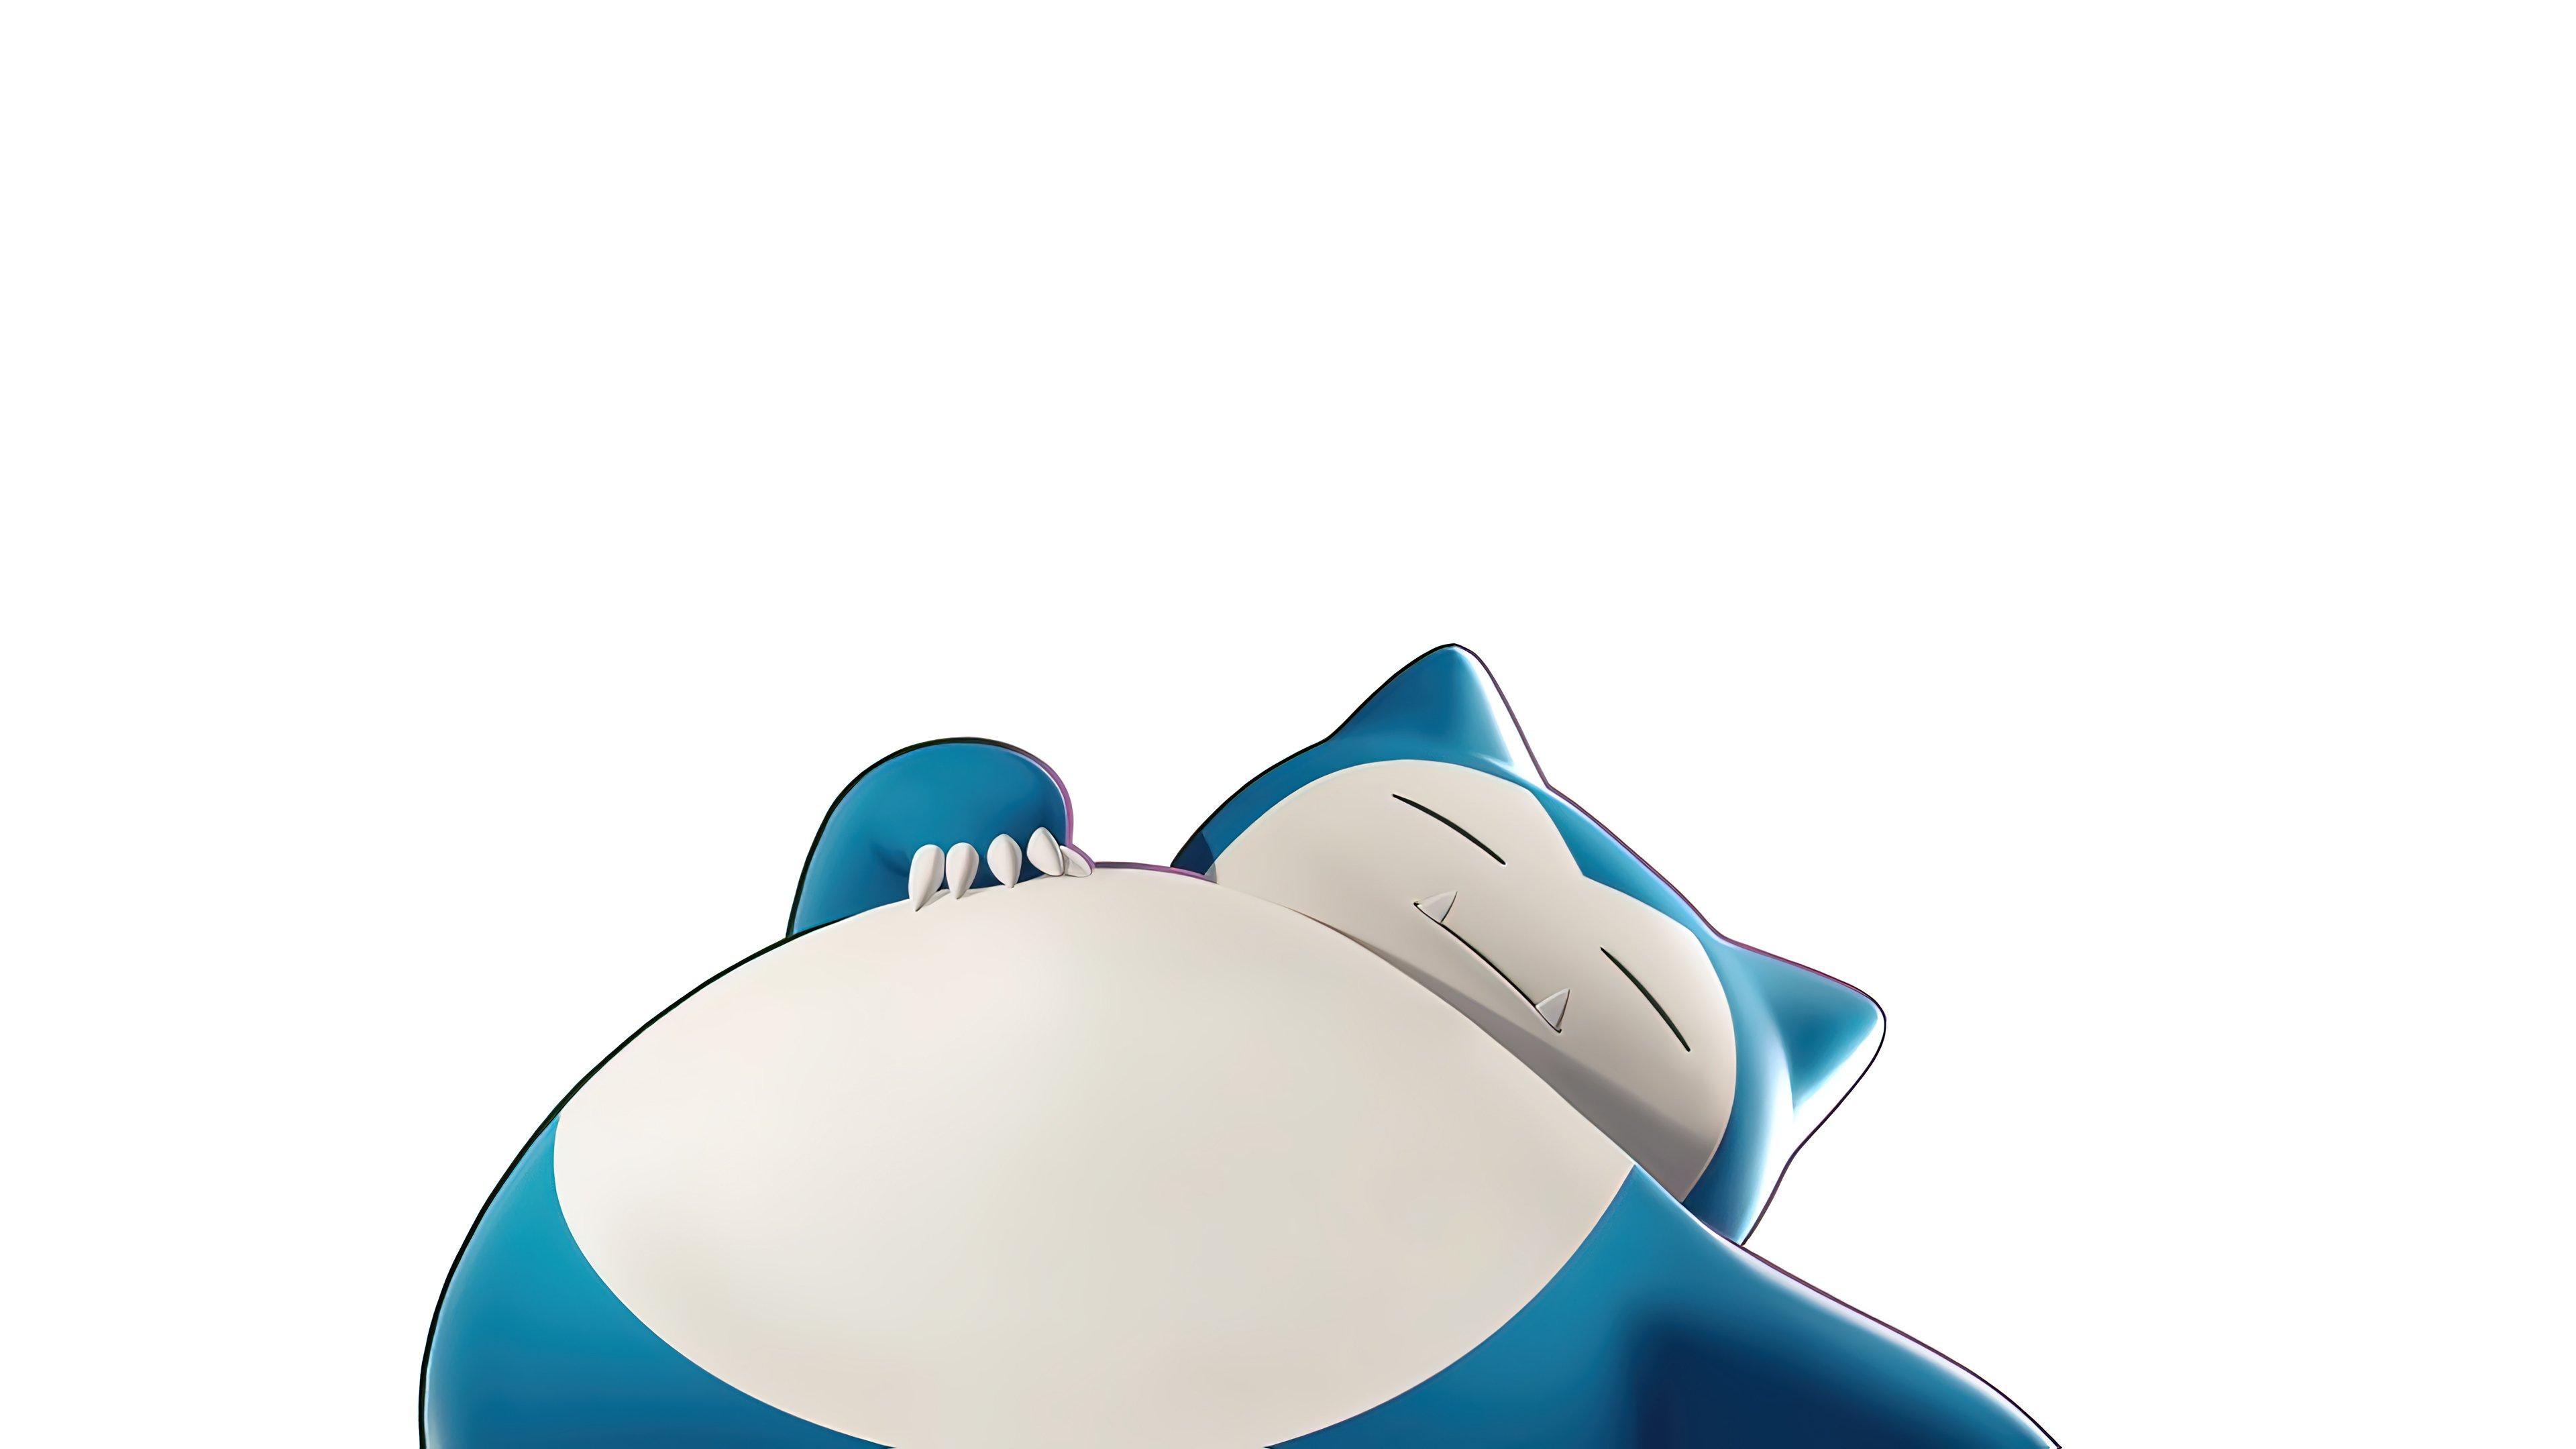 Fondos de pantalla Snorlax de Pokemon